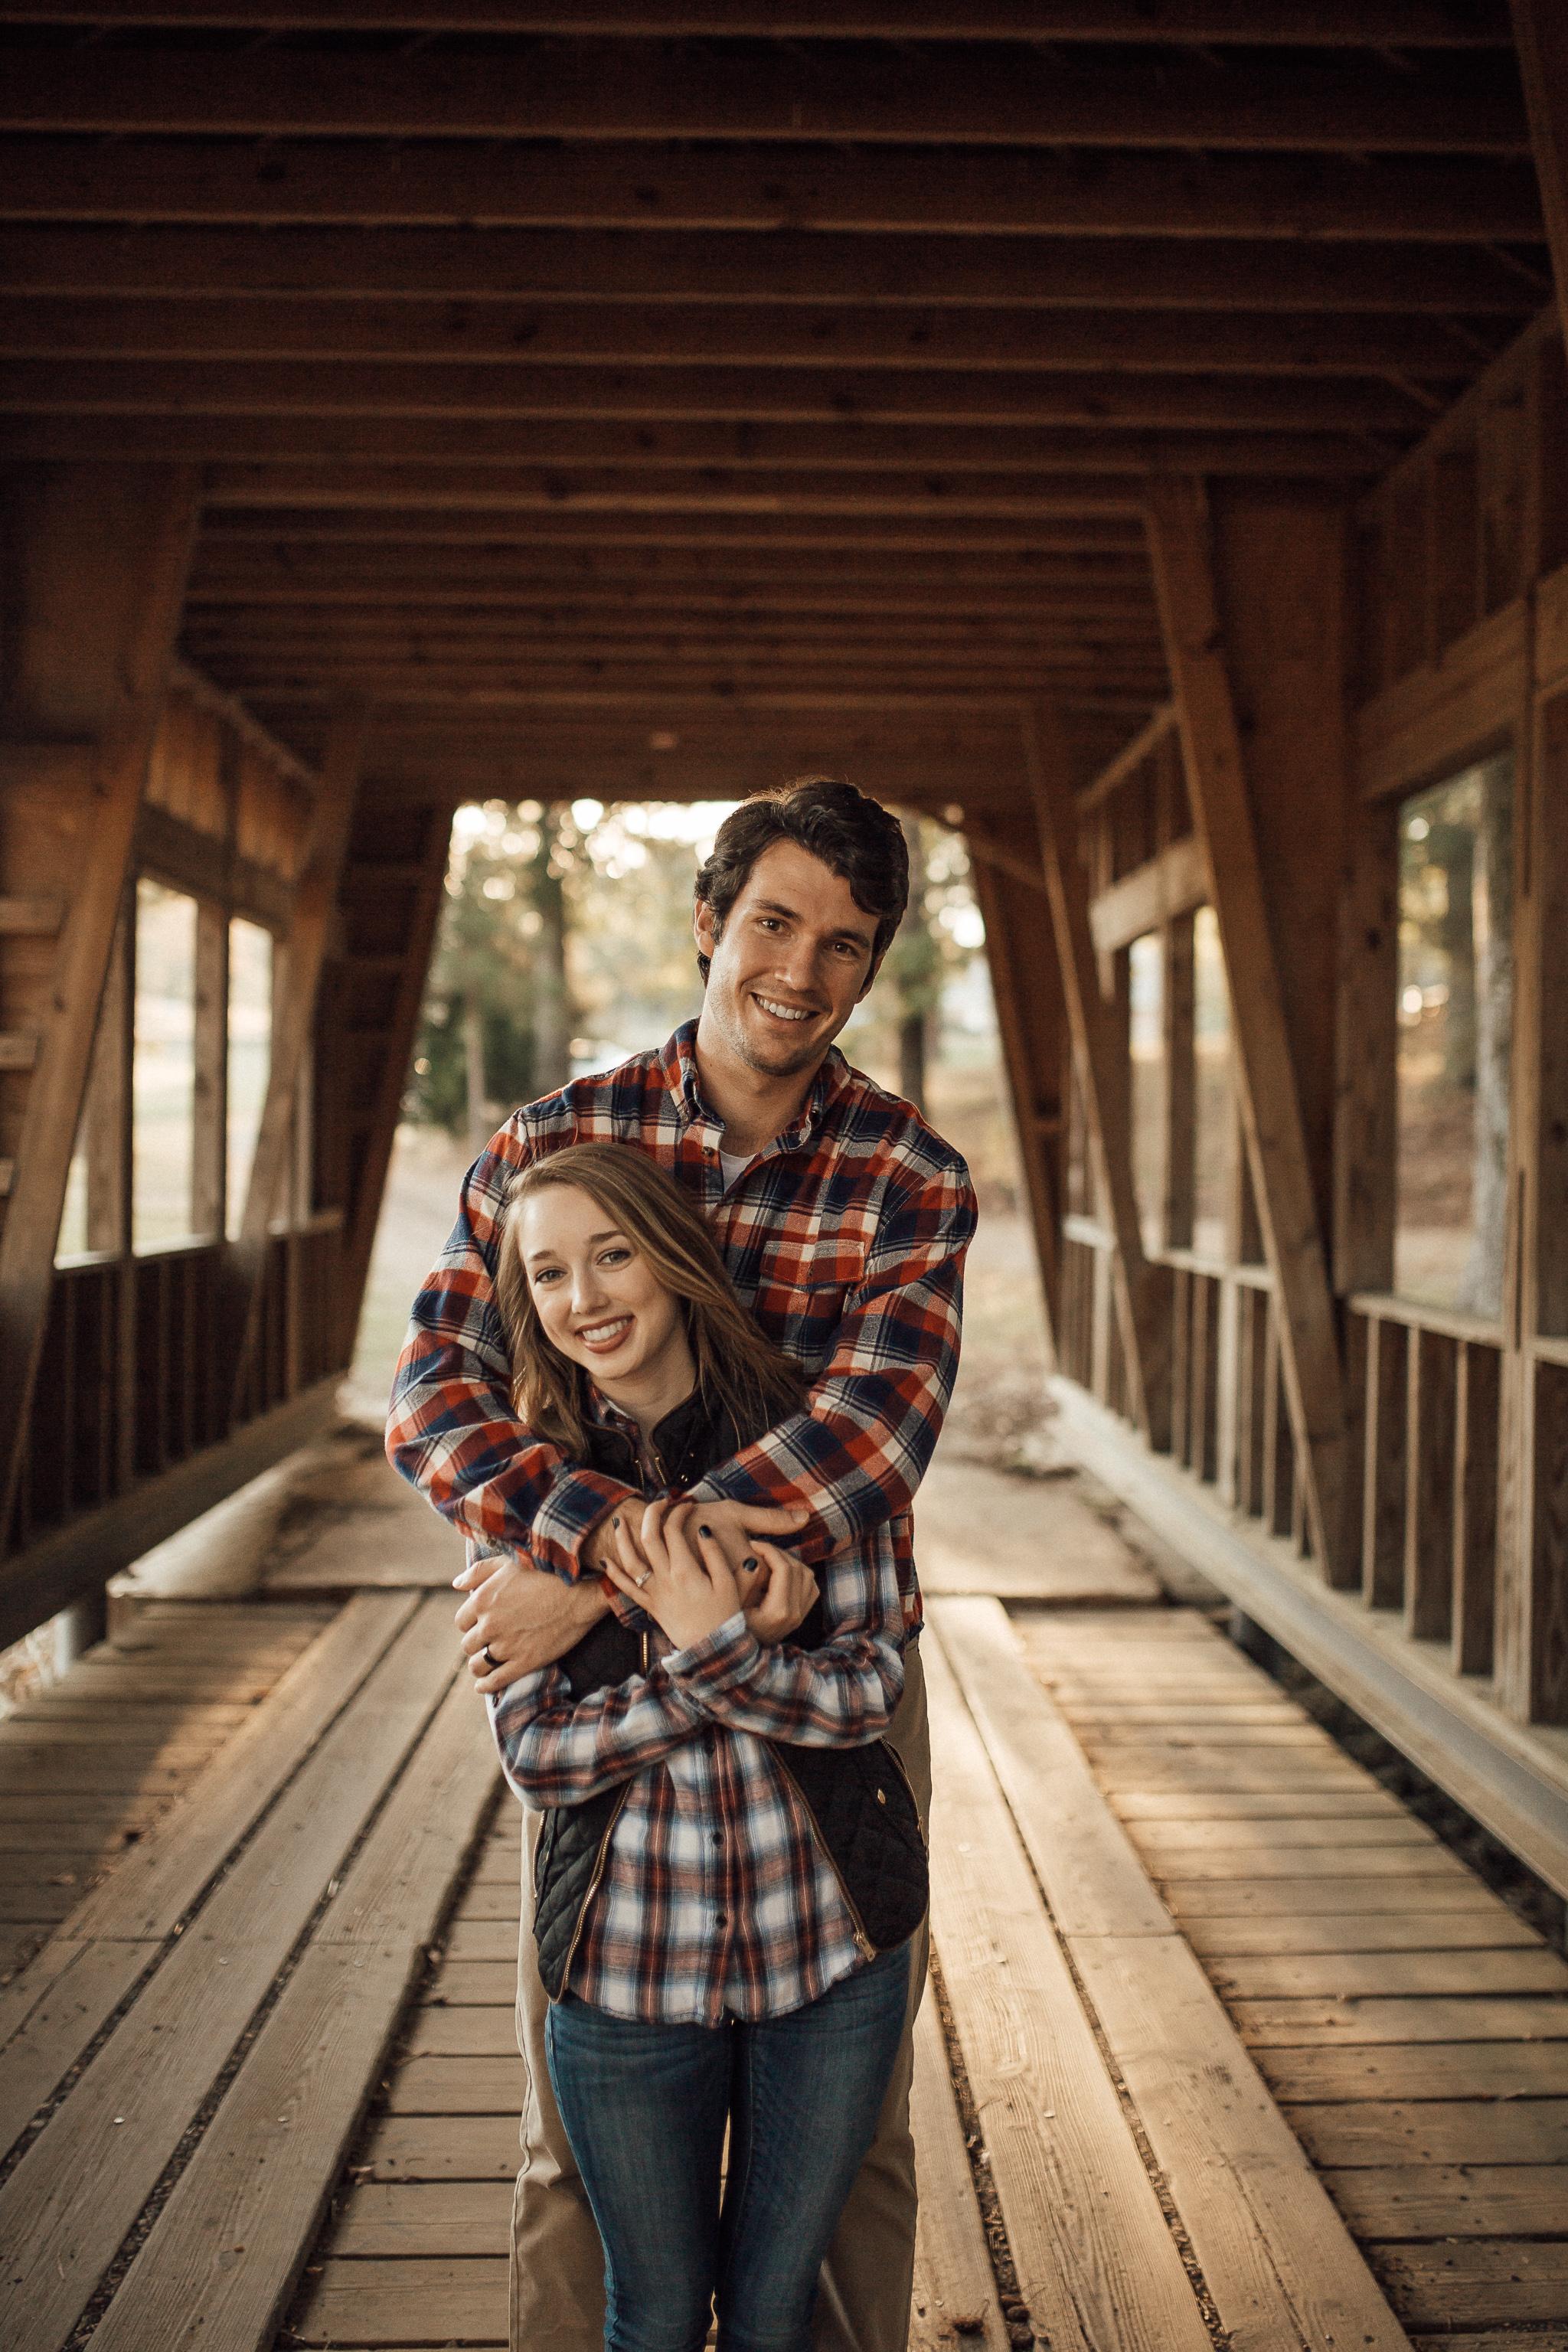 cassie-cook-photography-memphis-wedding-photographer-first-christmas-together-nesbit-christmas-tree-farm-hernando-ms